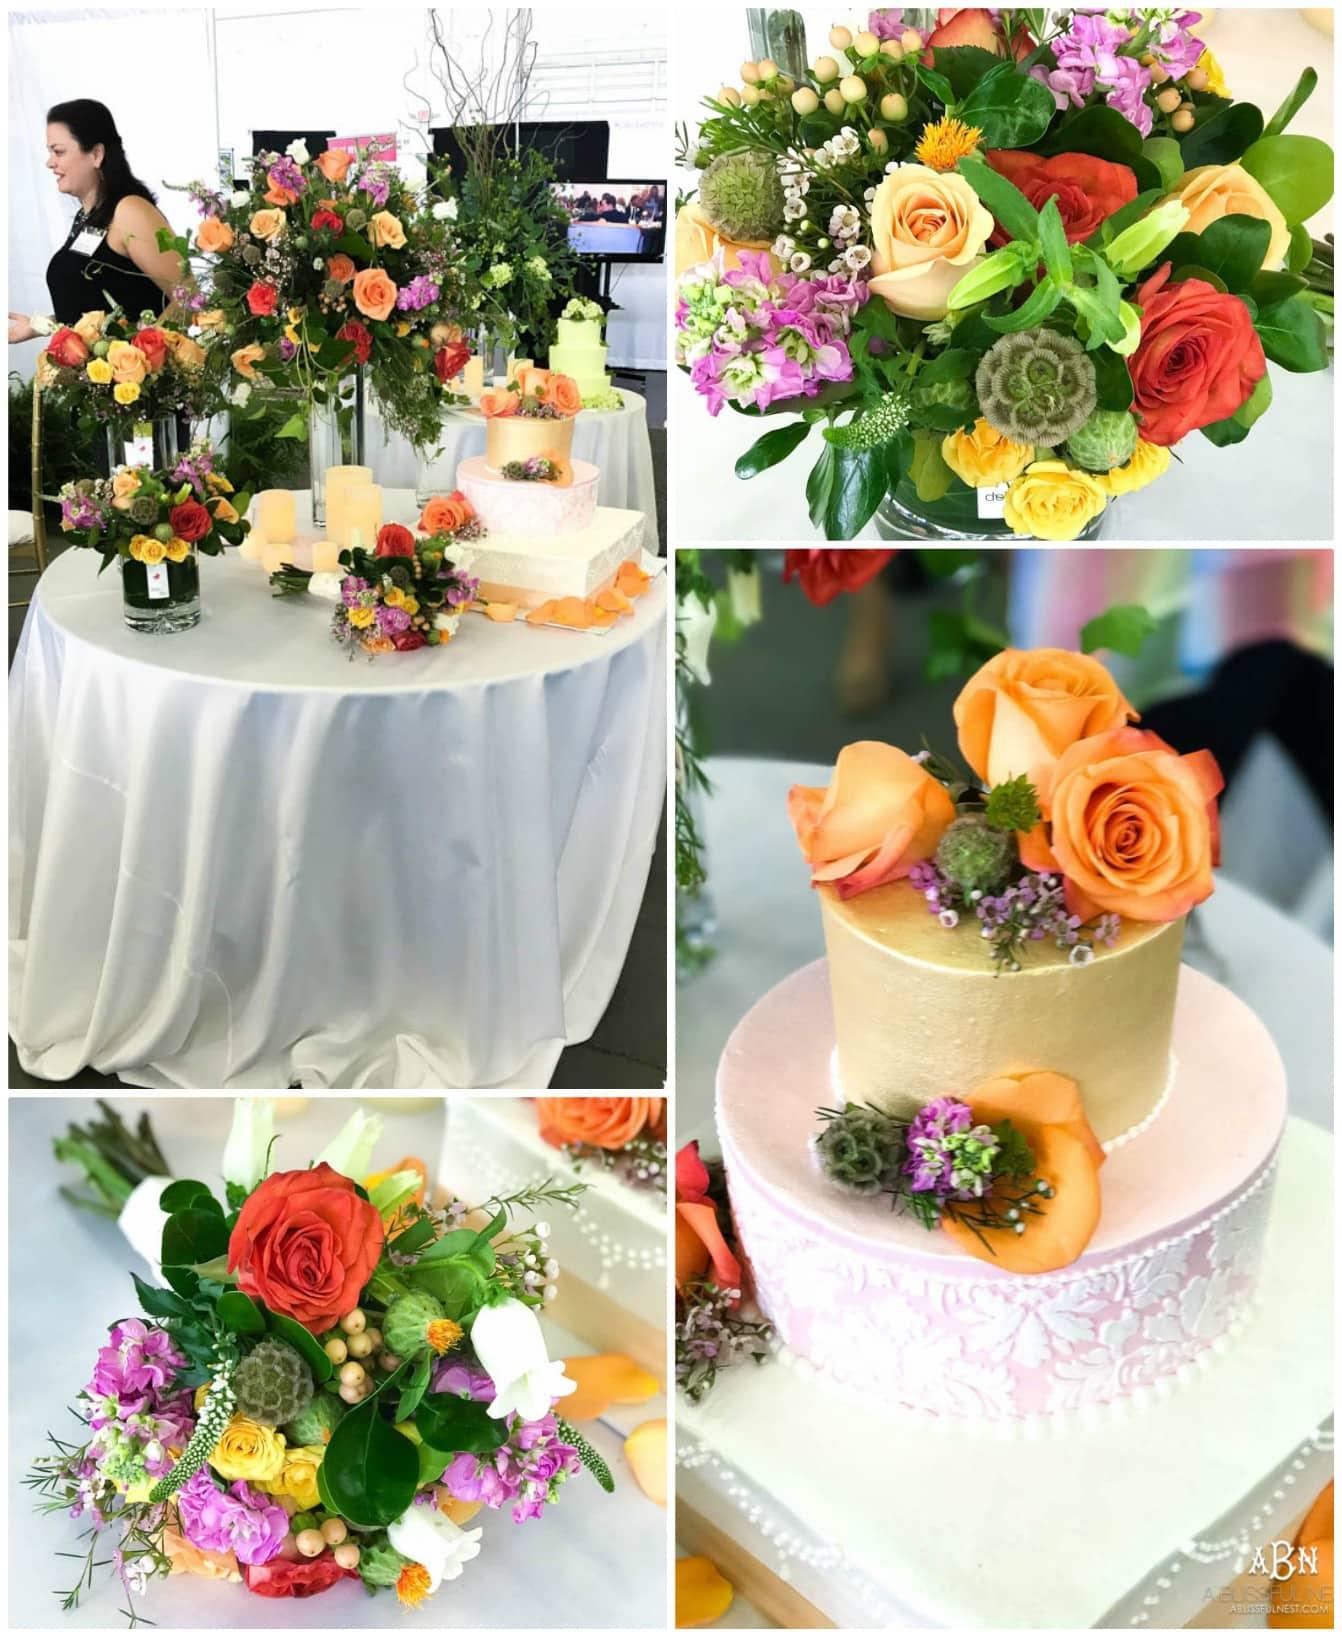 Wedding Flowers By Season 81 Elegant Now these designer flowers